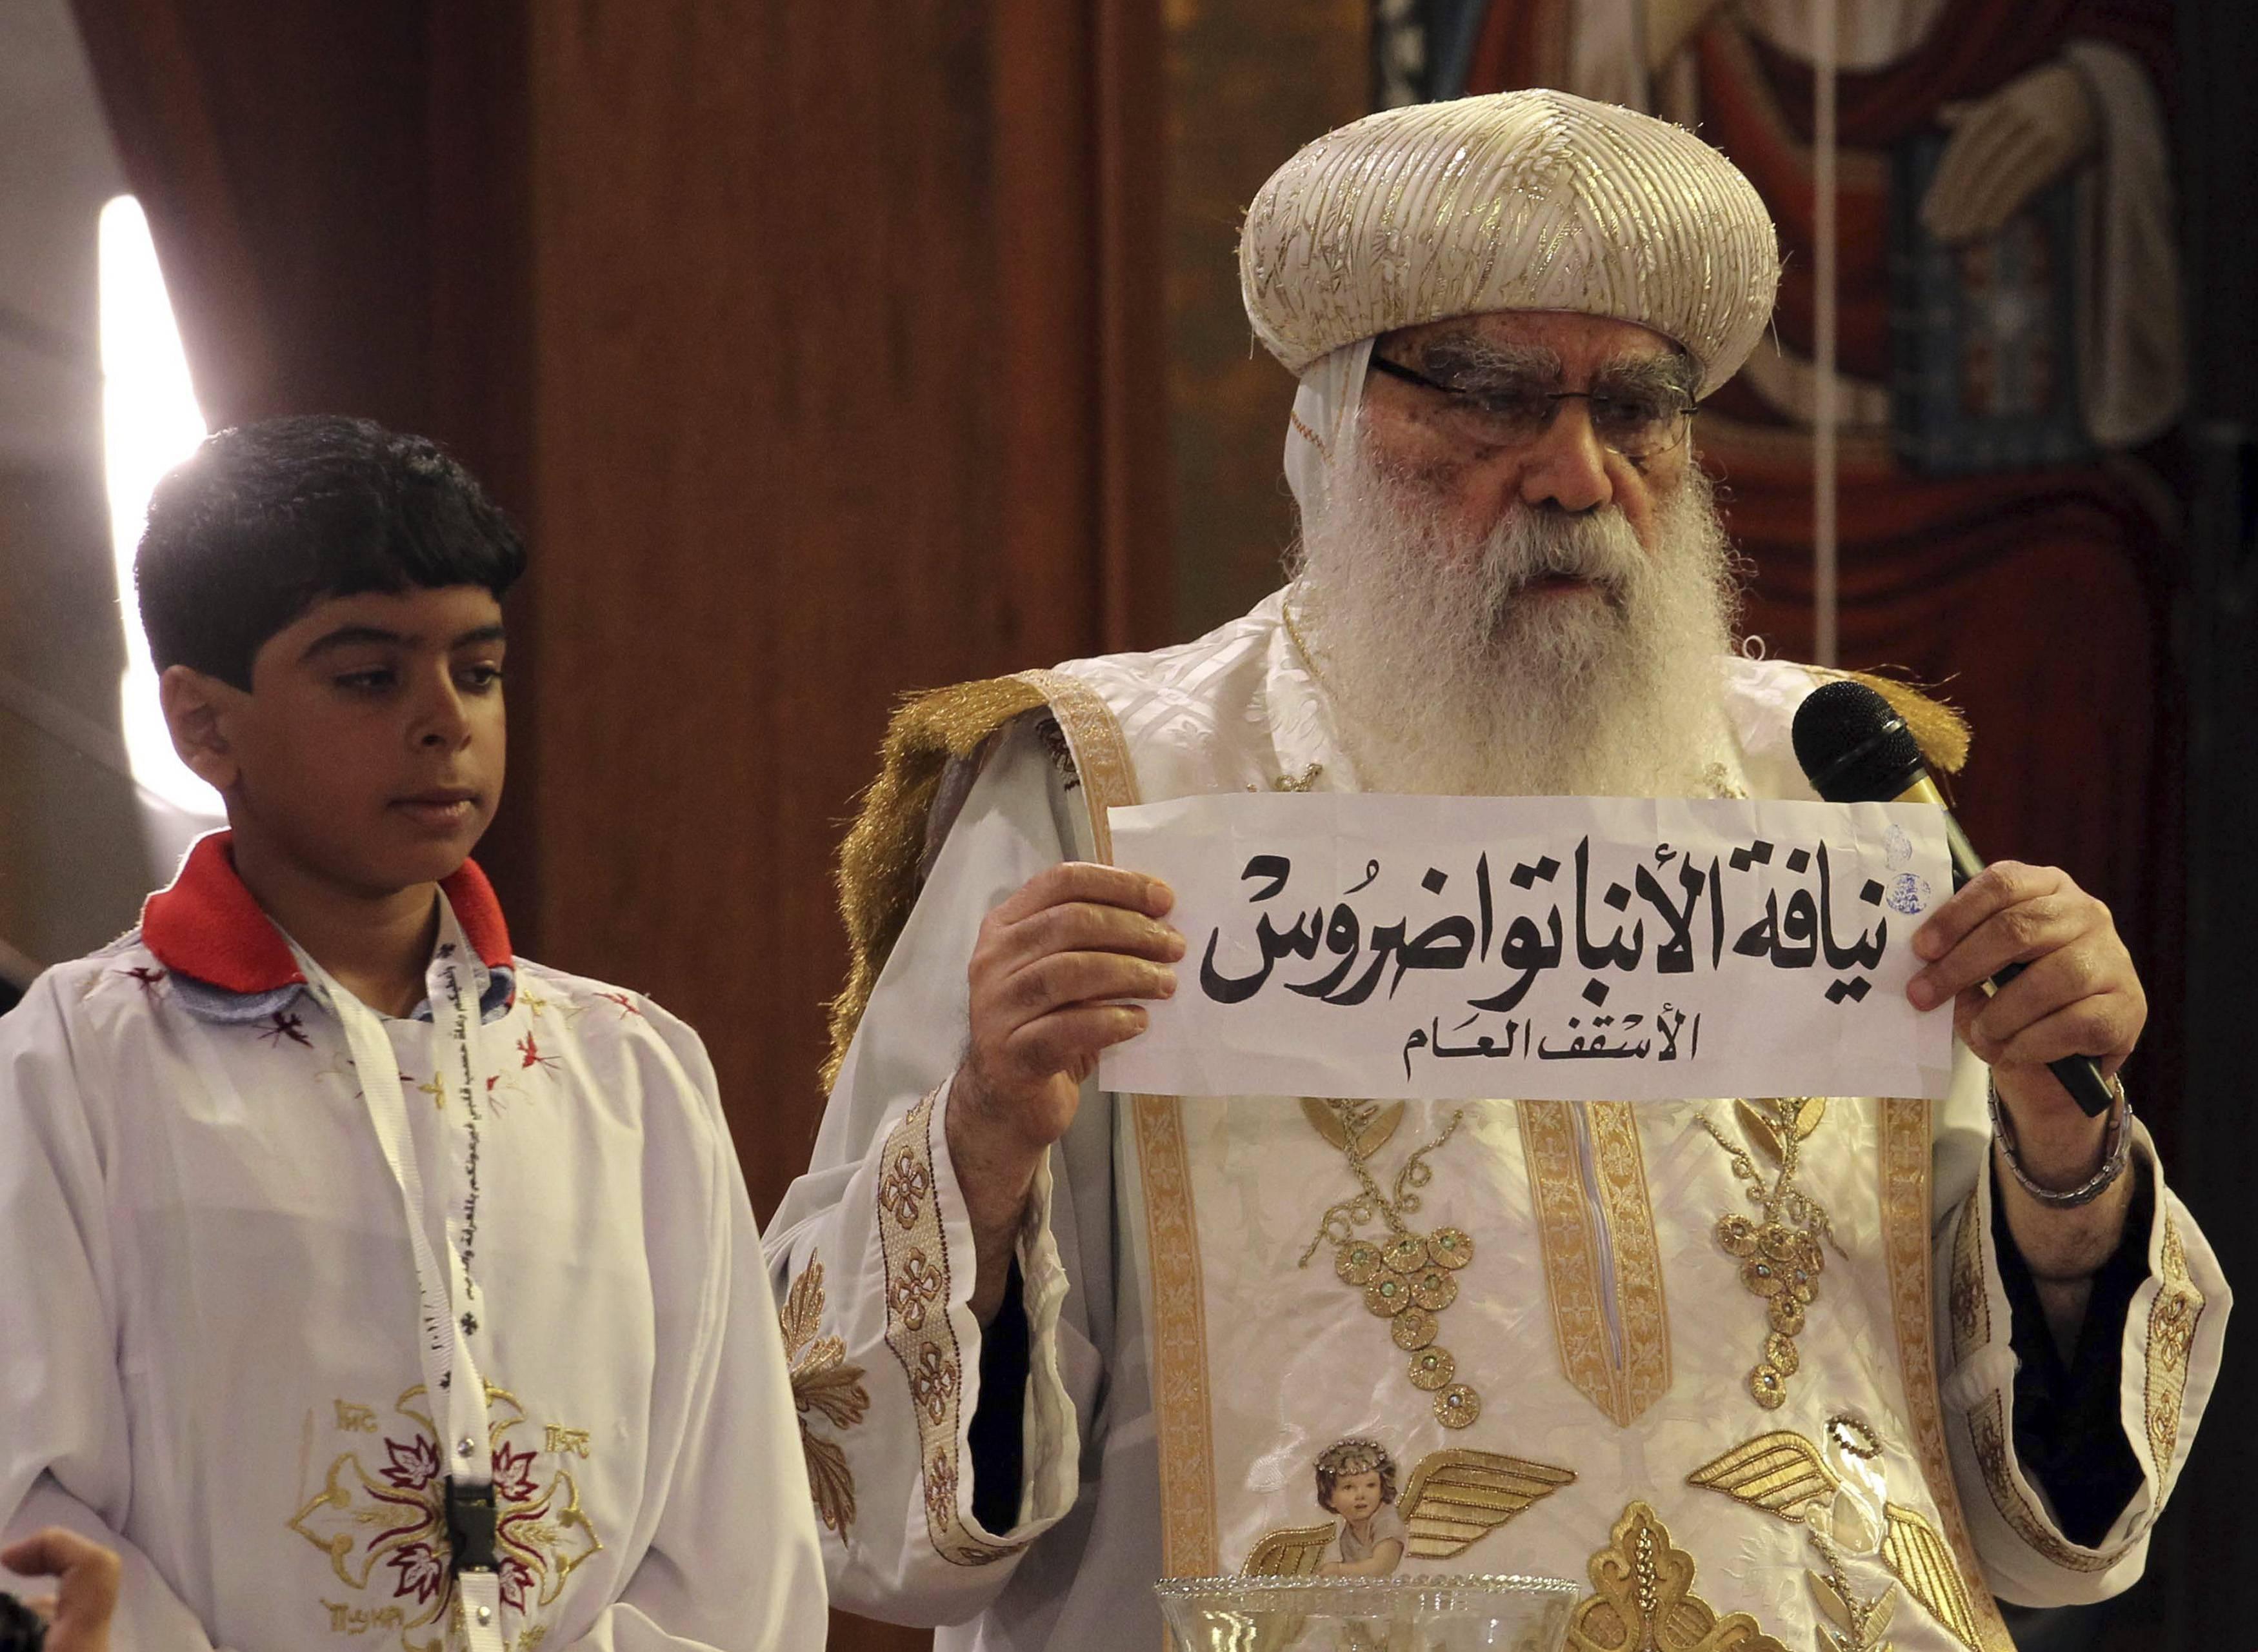 Mursi meets new pope, reassures Egypt's Christians